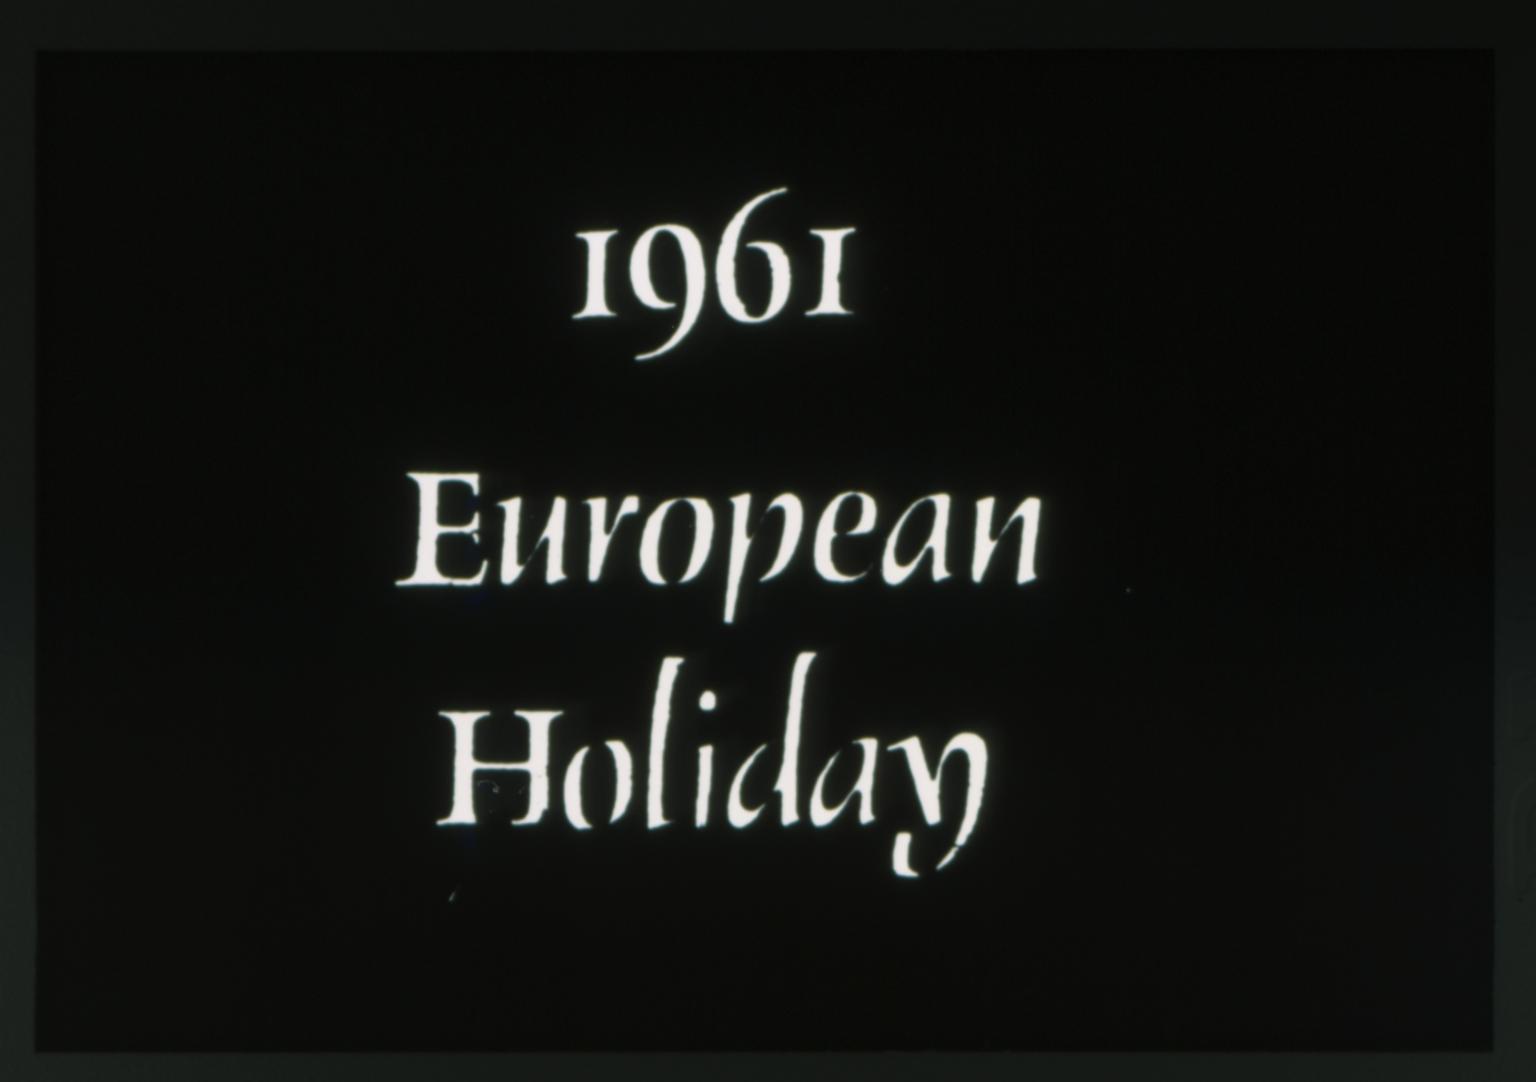 1961 Spring Weekend theme - European Holiday